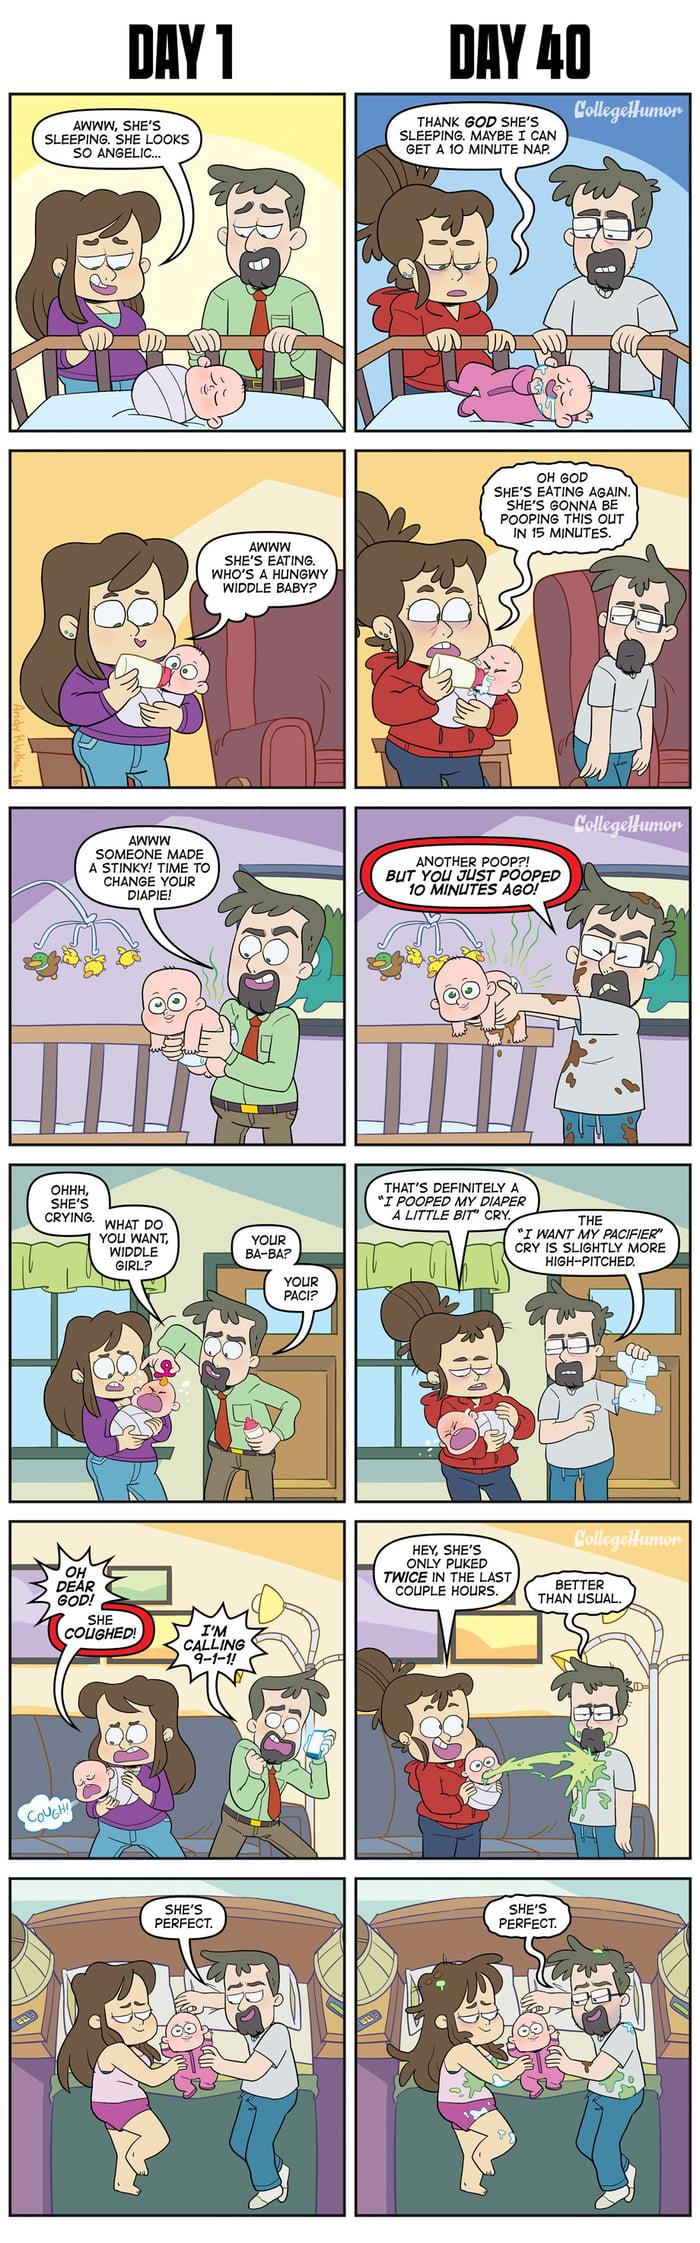 New Baby: Day 1 vs Day 40